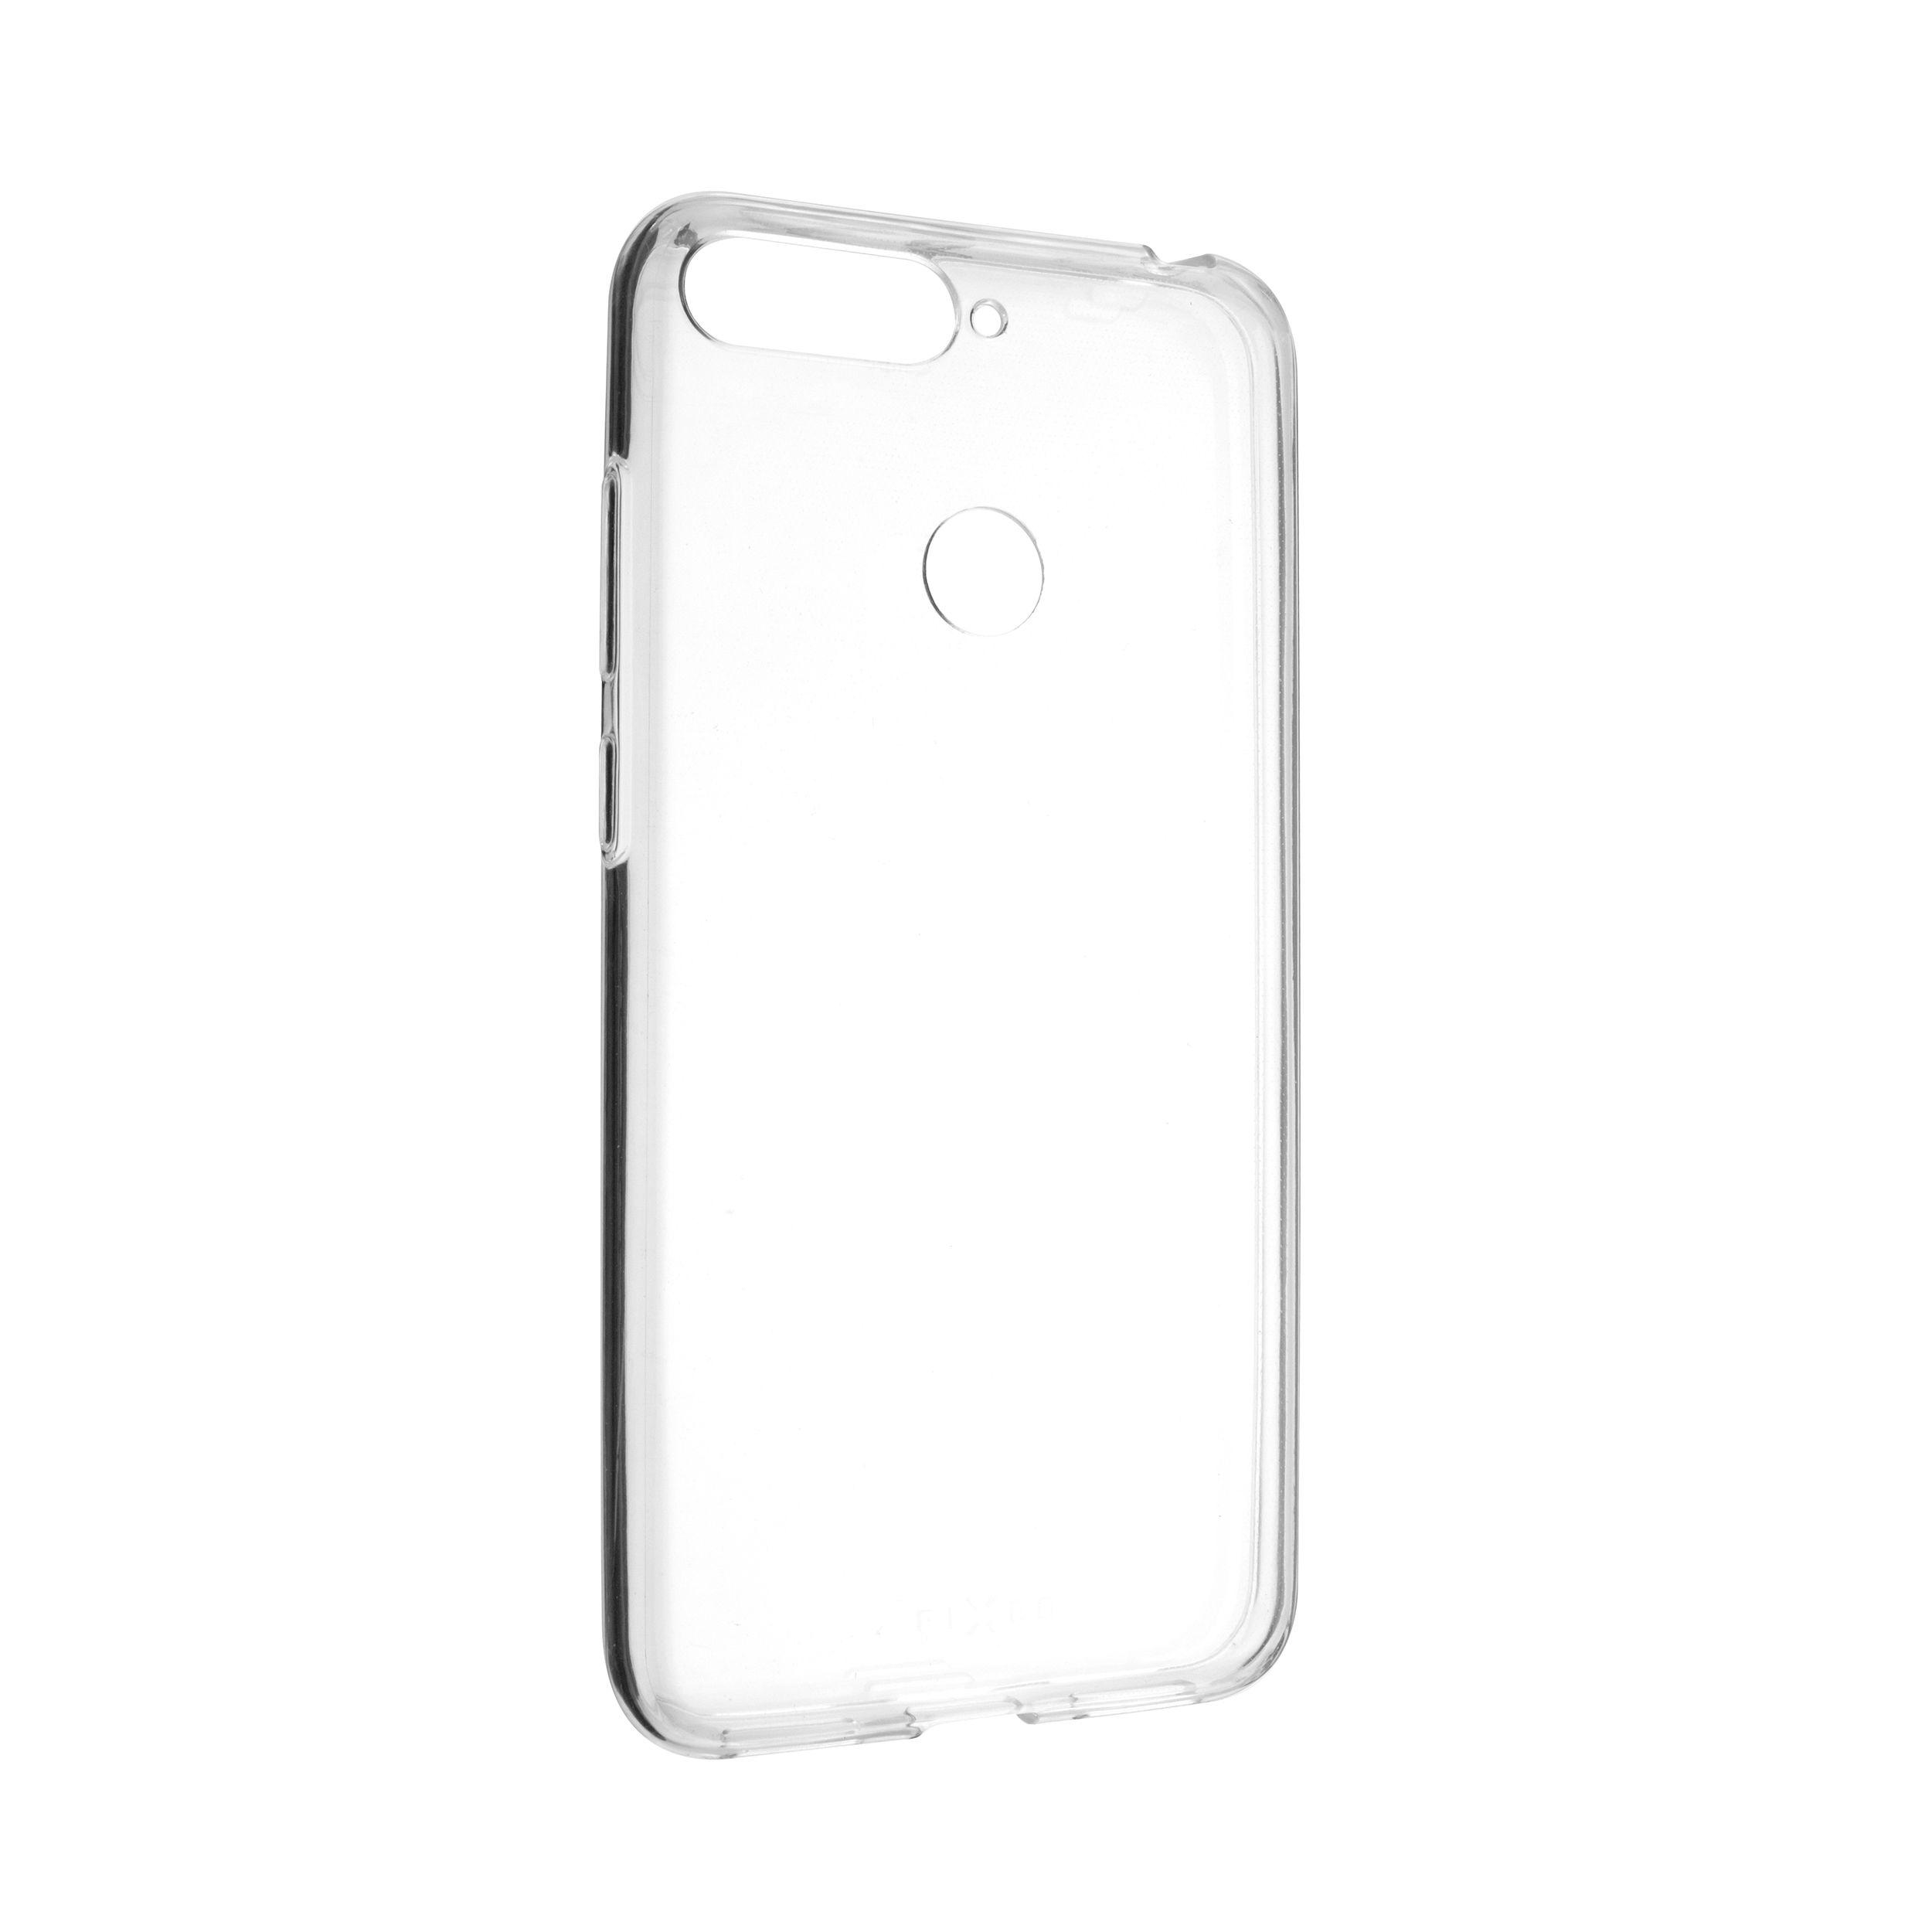 Ultratenké TPU gelové pouzdro FIXED Skin pro Huawei Y6 Prime (2018), 0,6 mm, čiré